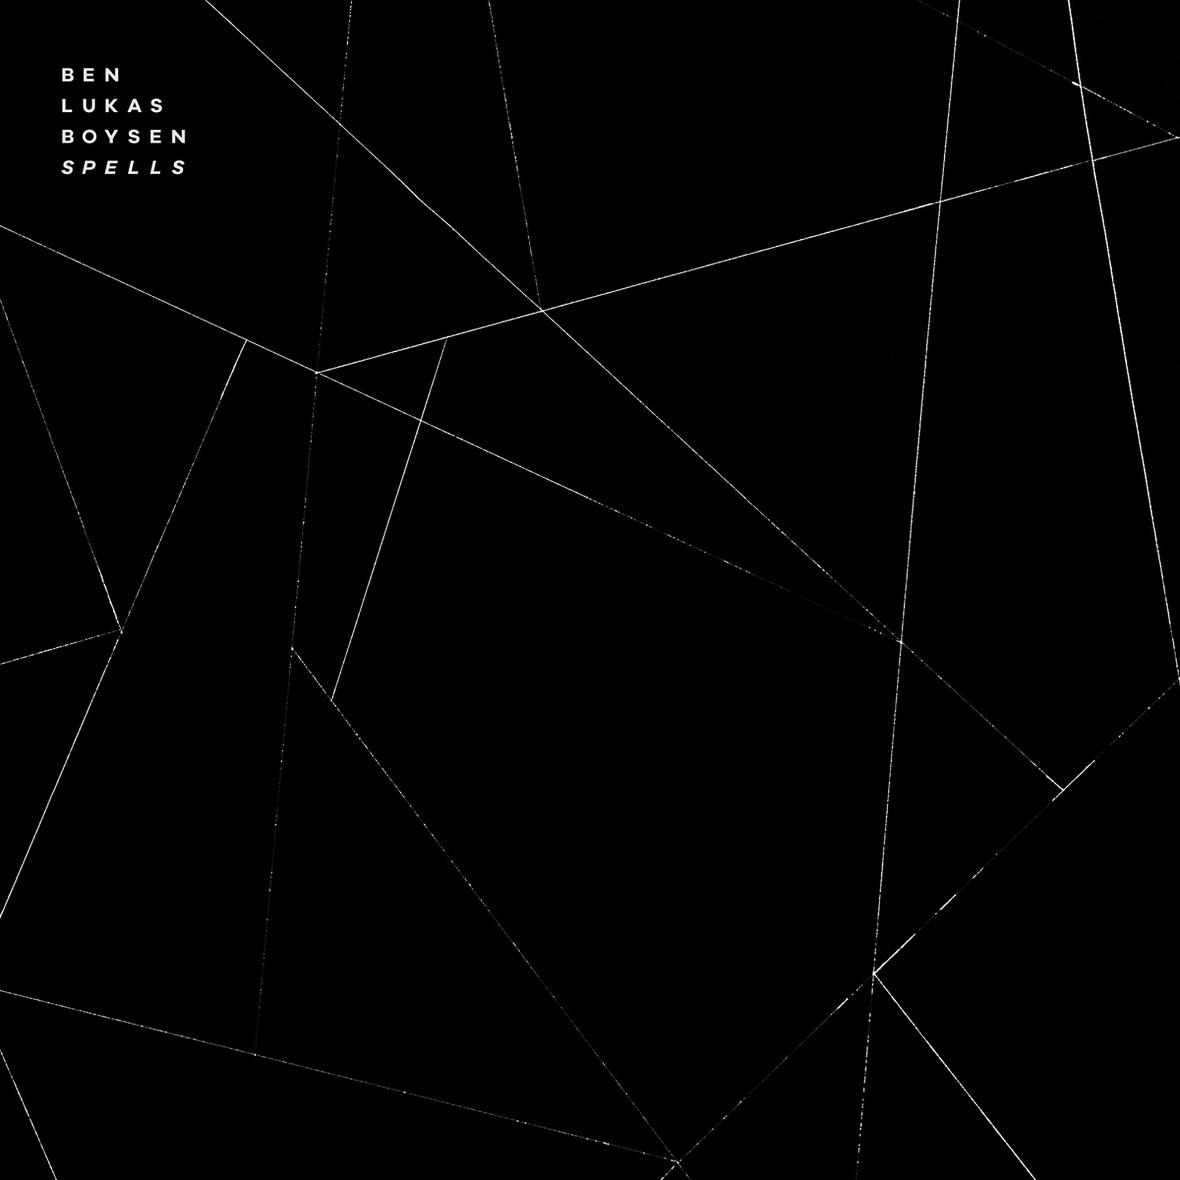 Ben Lukas Boysen – Spells (Erased Tapes)